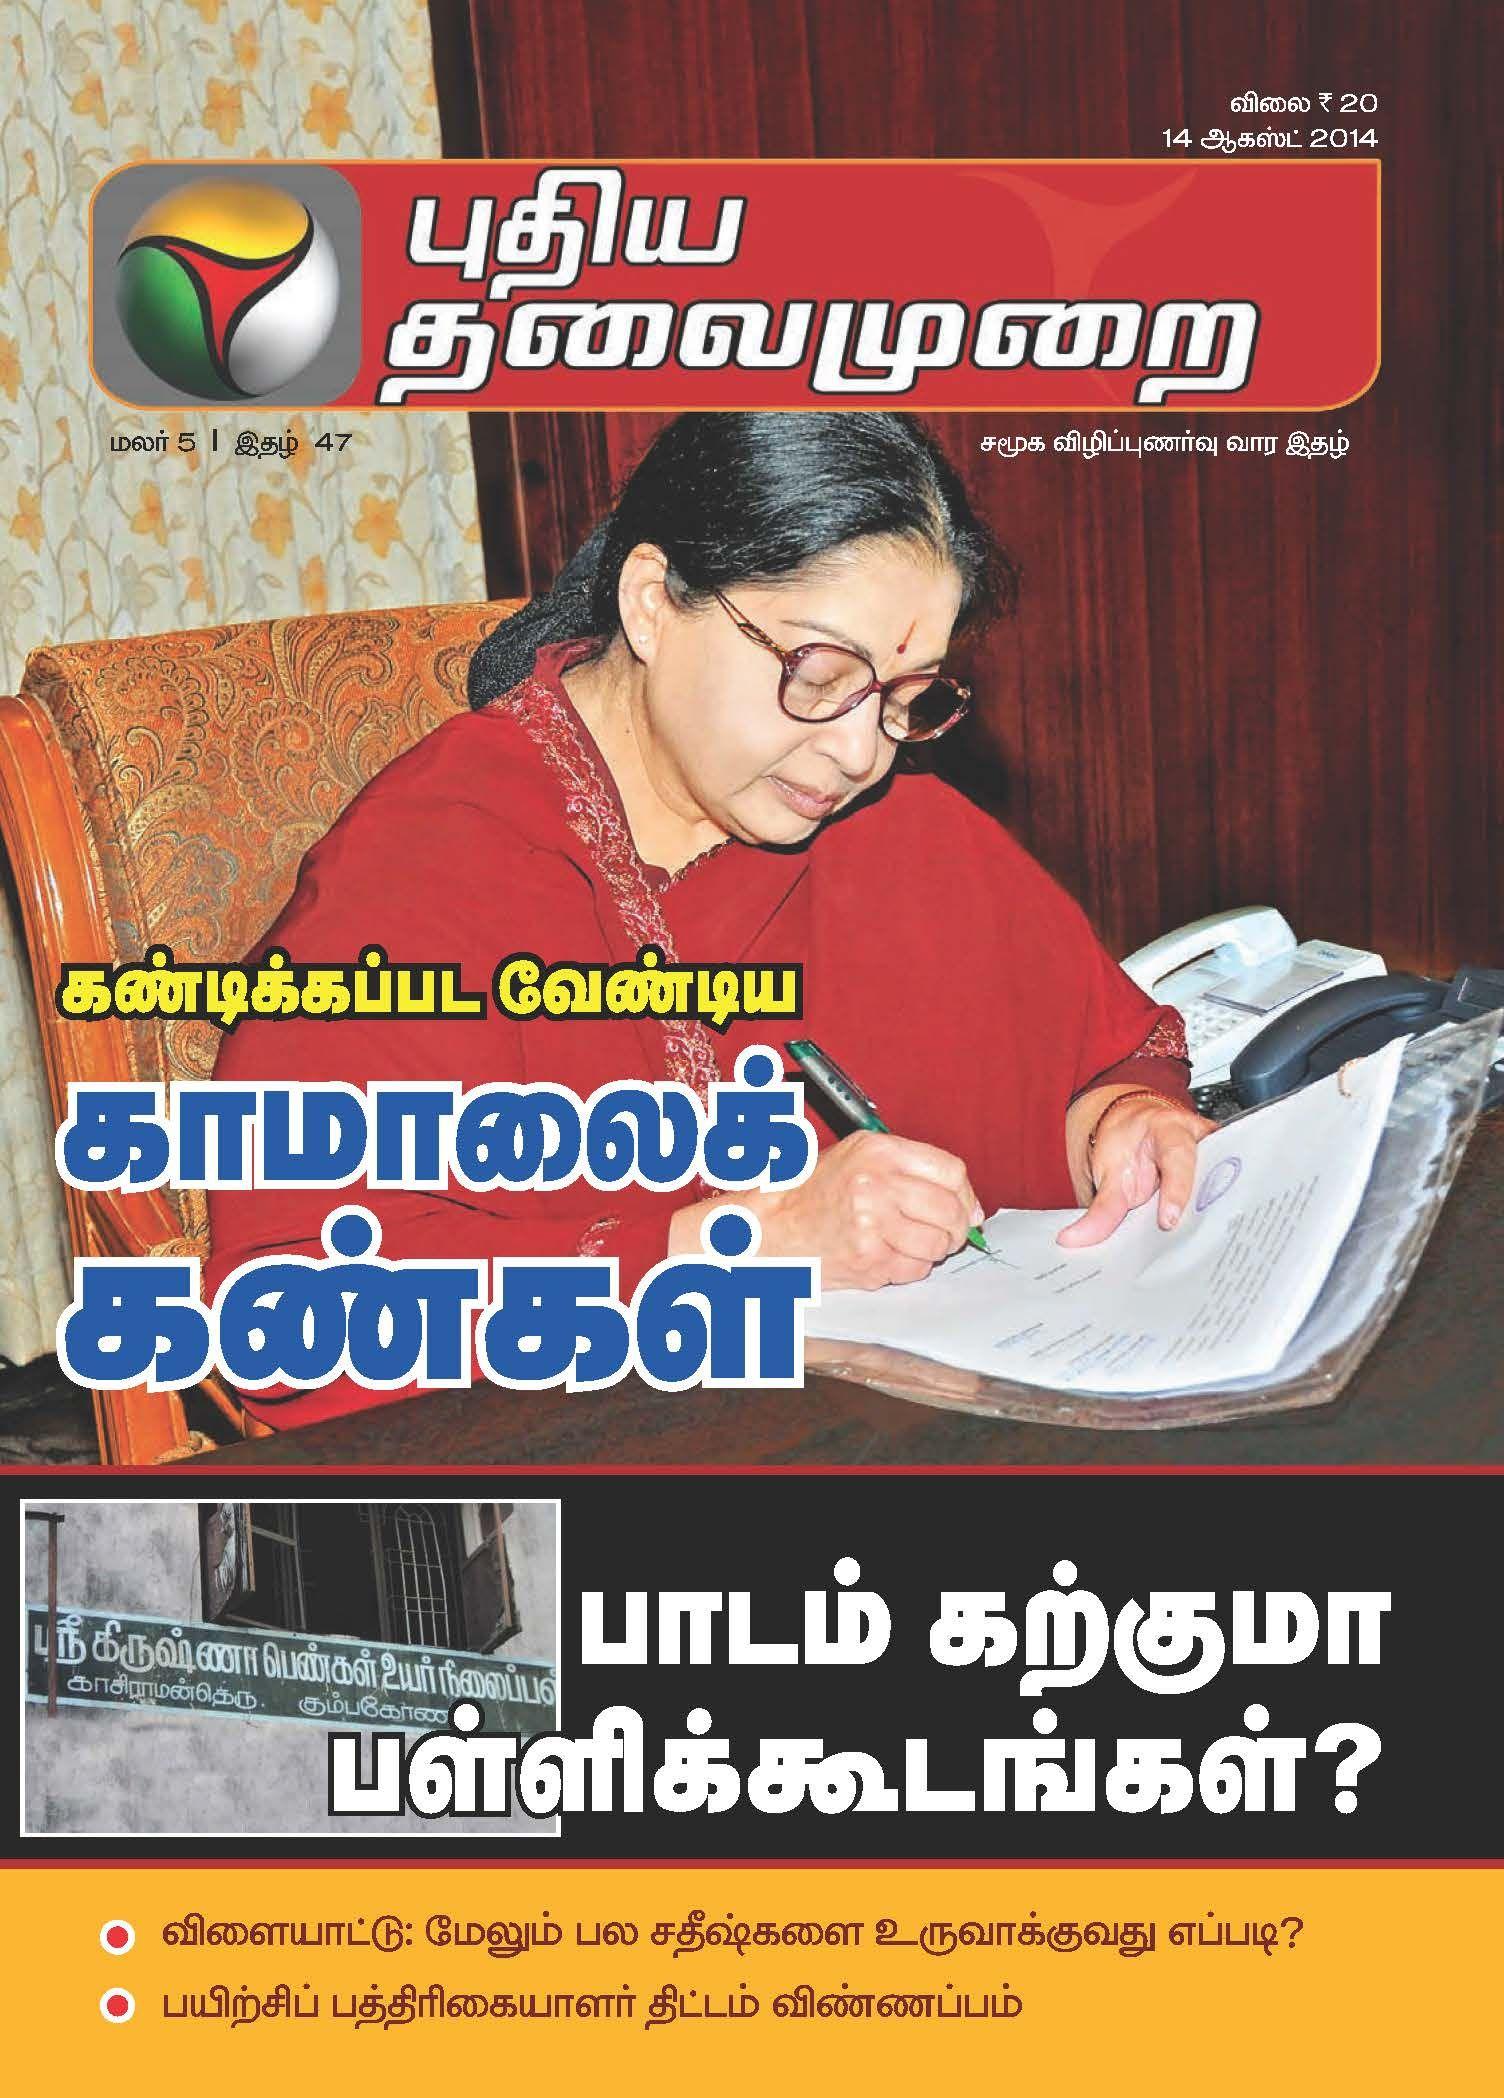 Puthiya Thalaimurai August 14, 2014 edition Read the